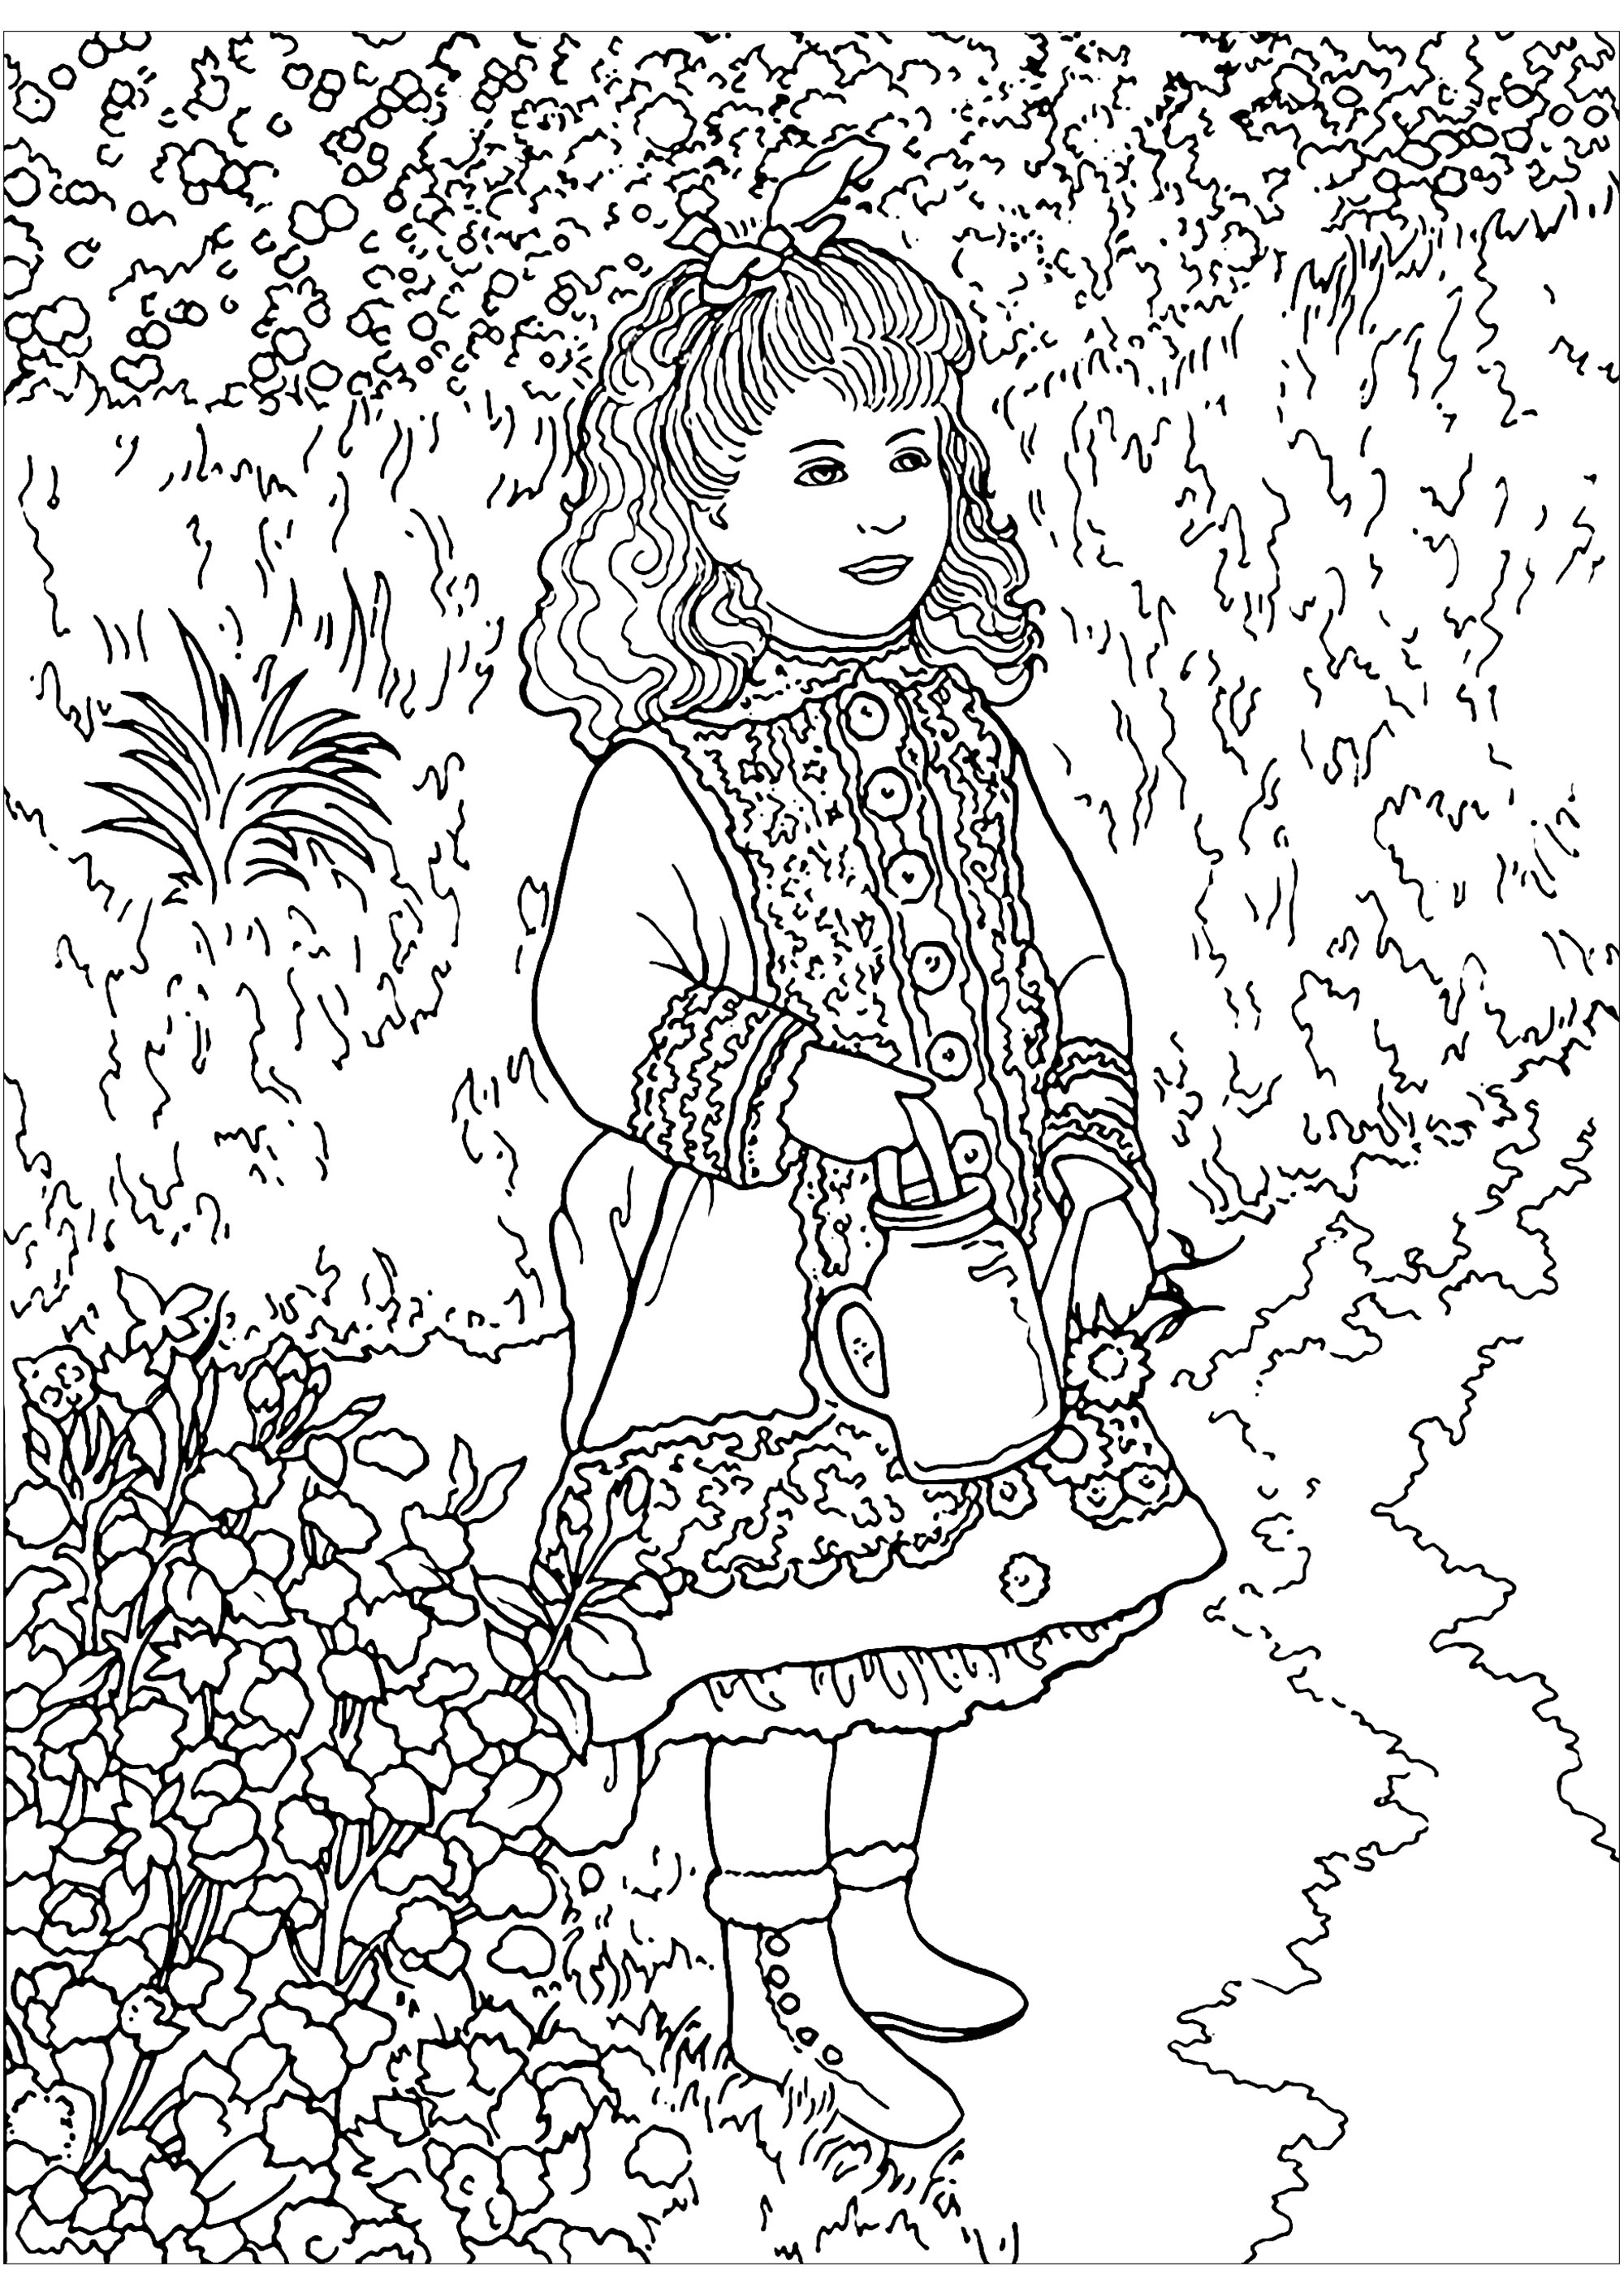 Disegni da Colorare per Adulti : Opera d arte - 6